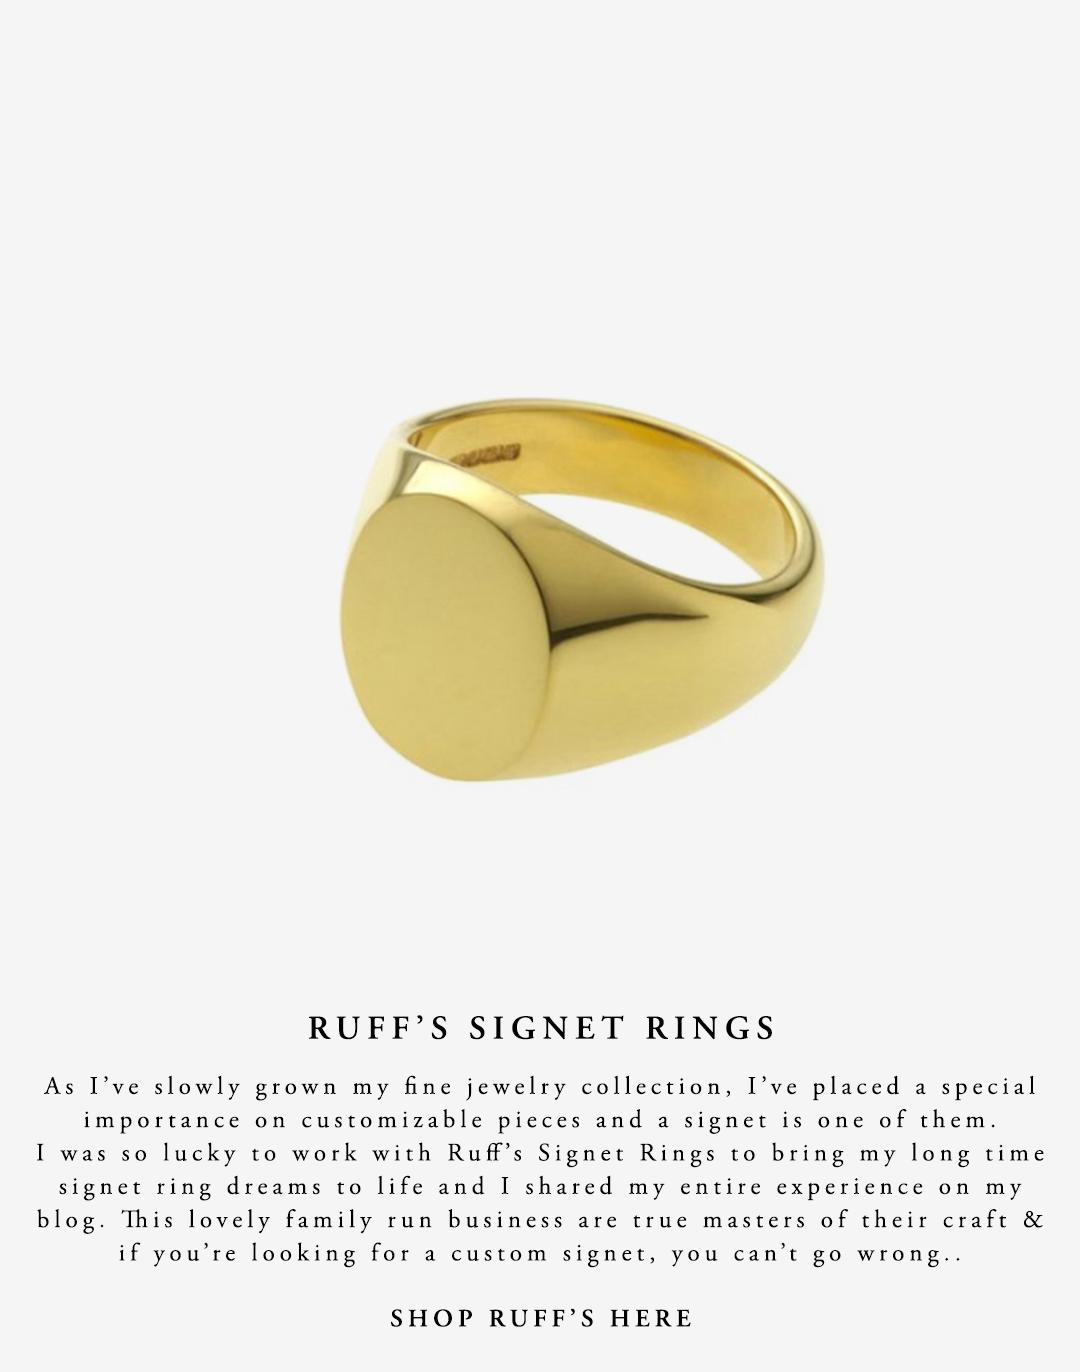 ruffs signet rings -.jpg